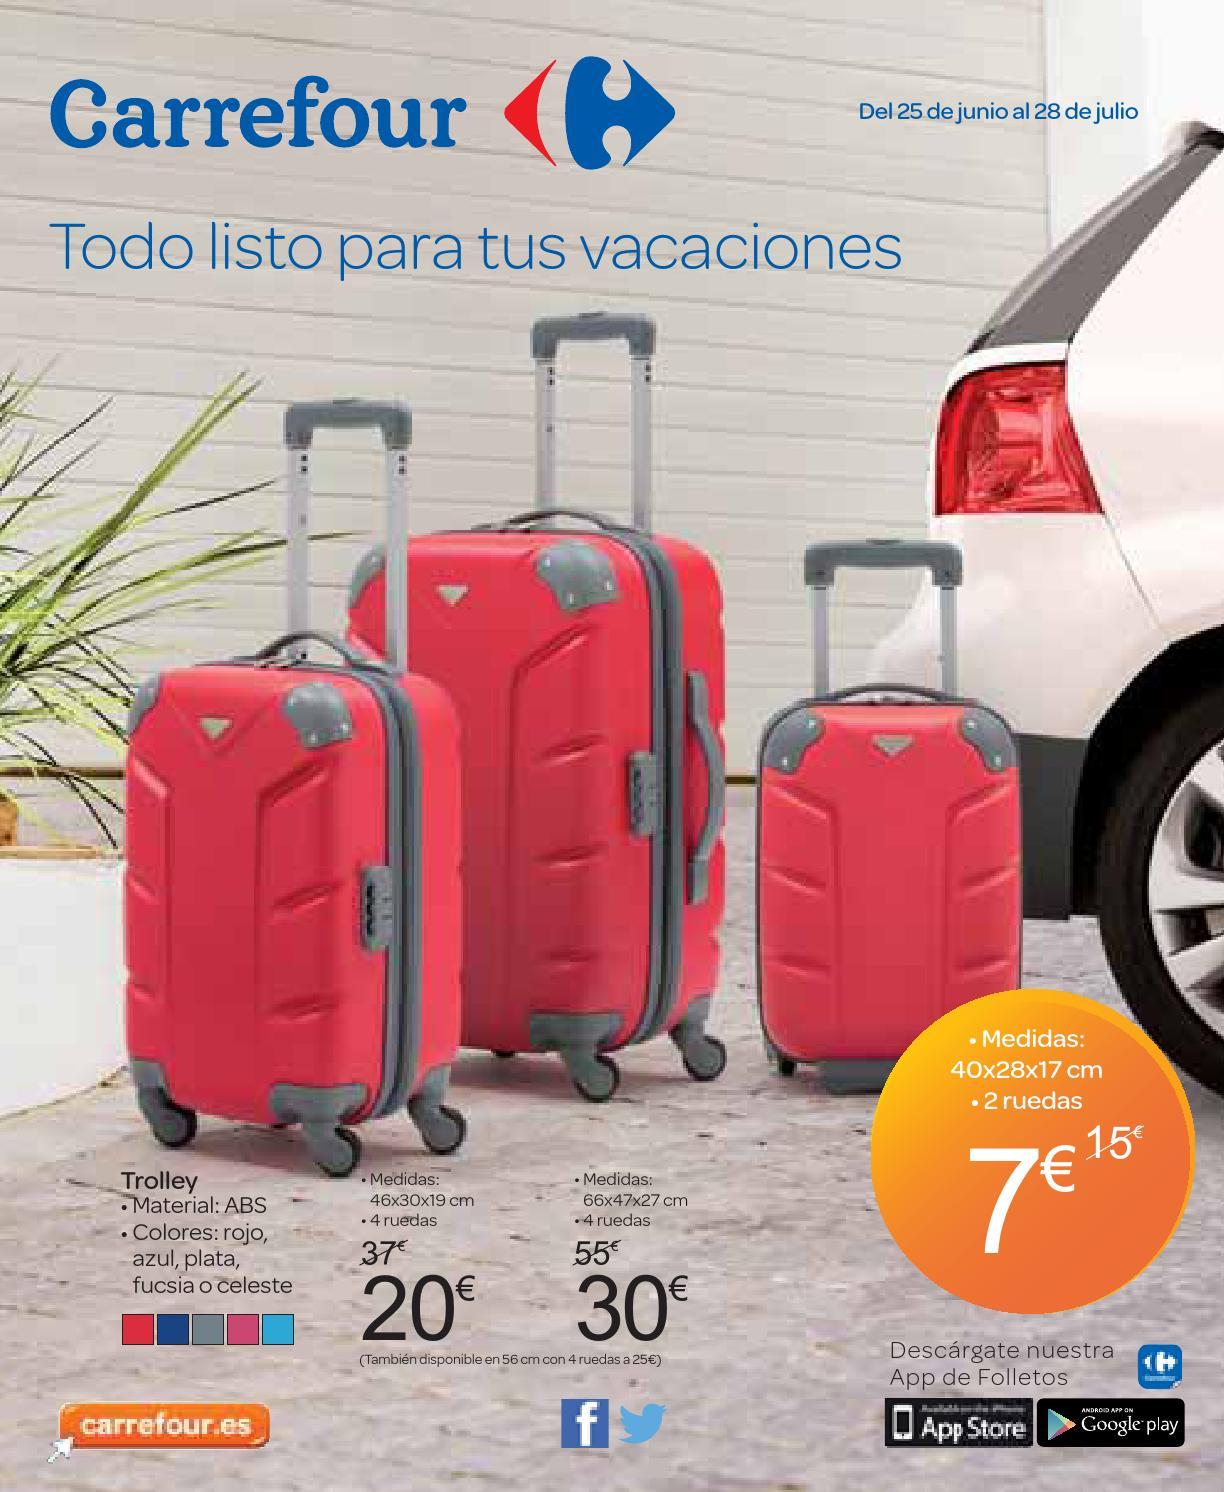 Catalogo carrefour vacaciones by carrefour online issuu - Maleta viaje carrefour ...